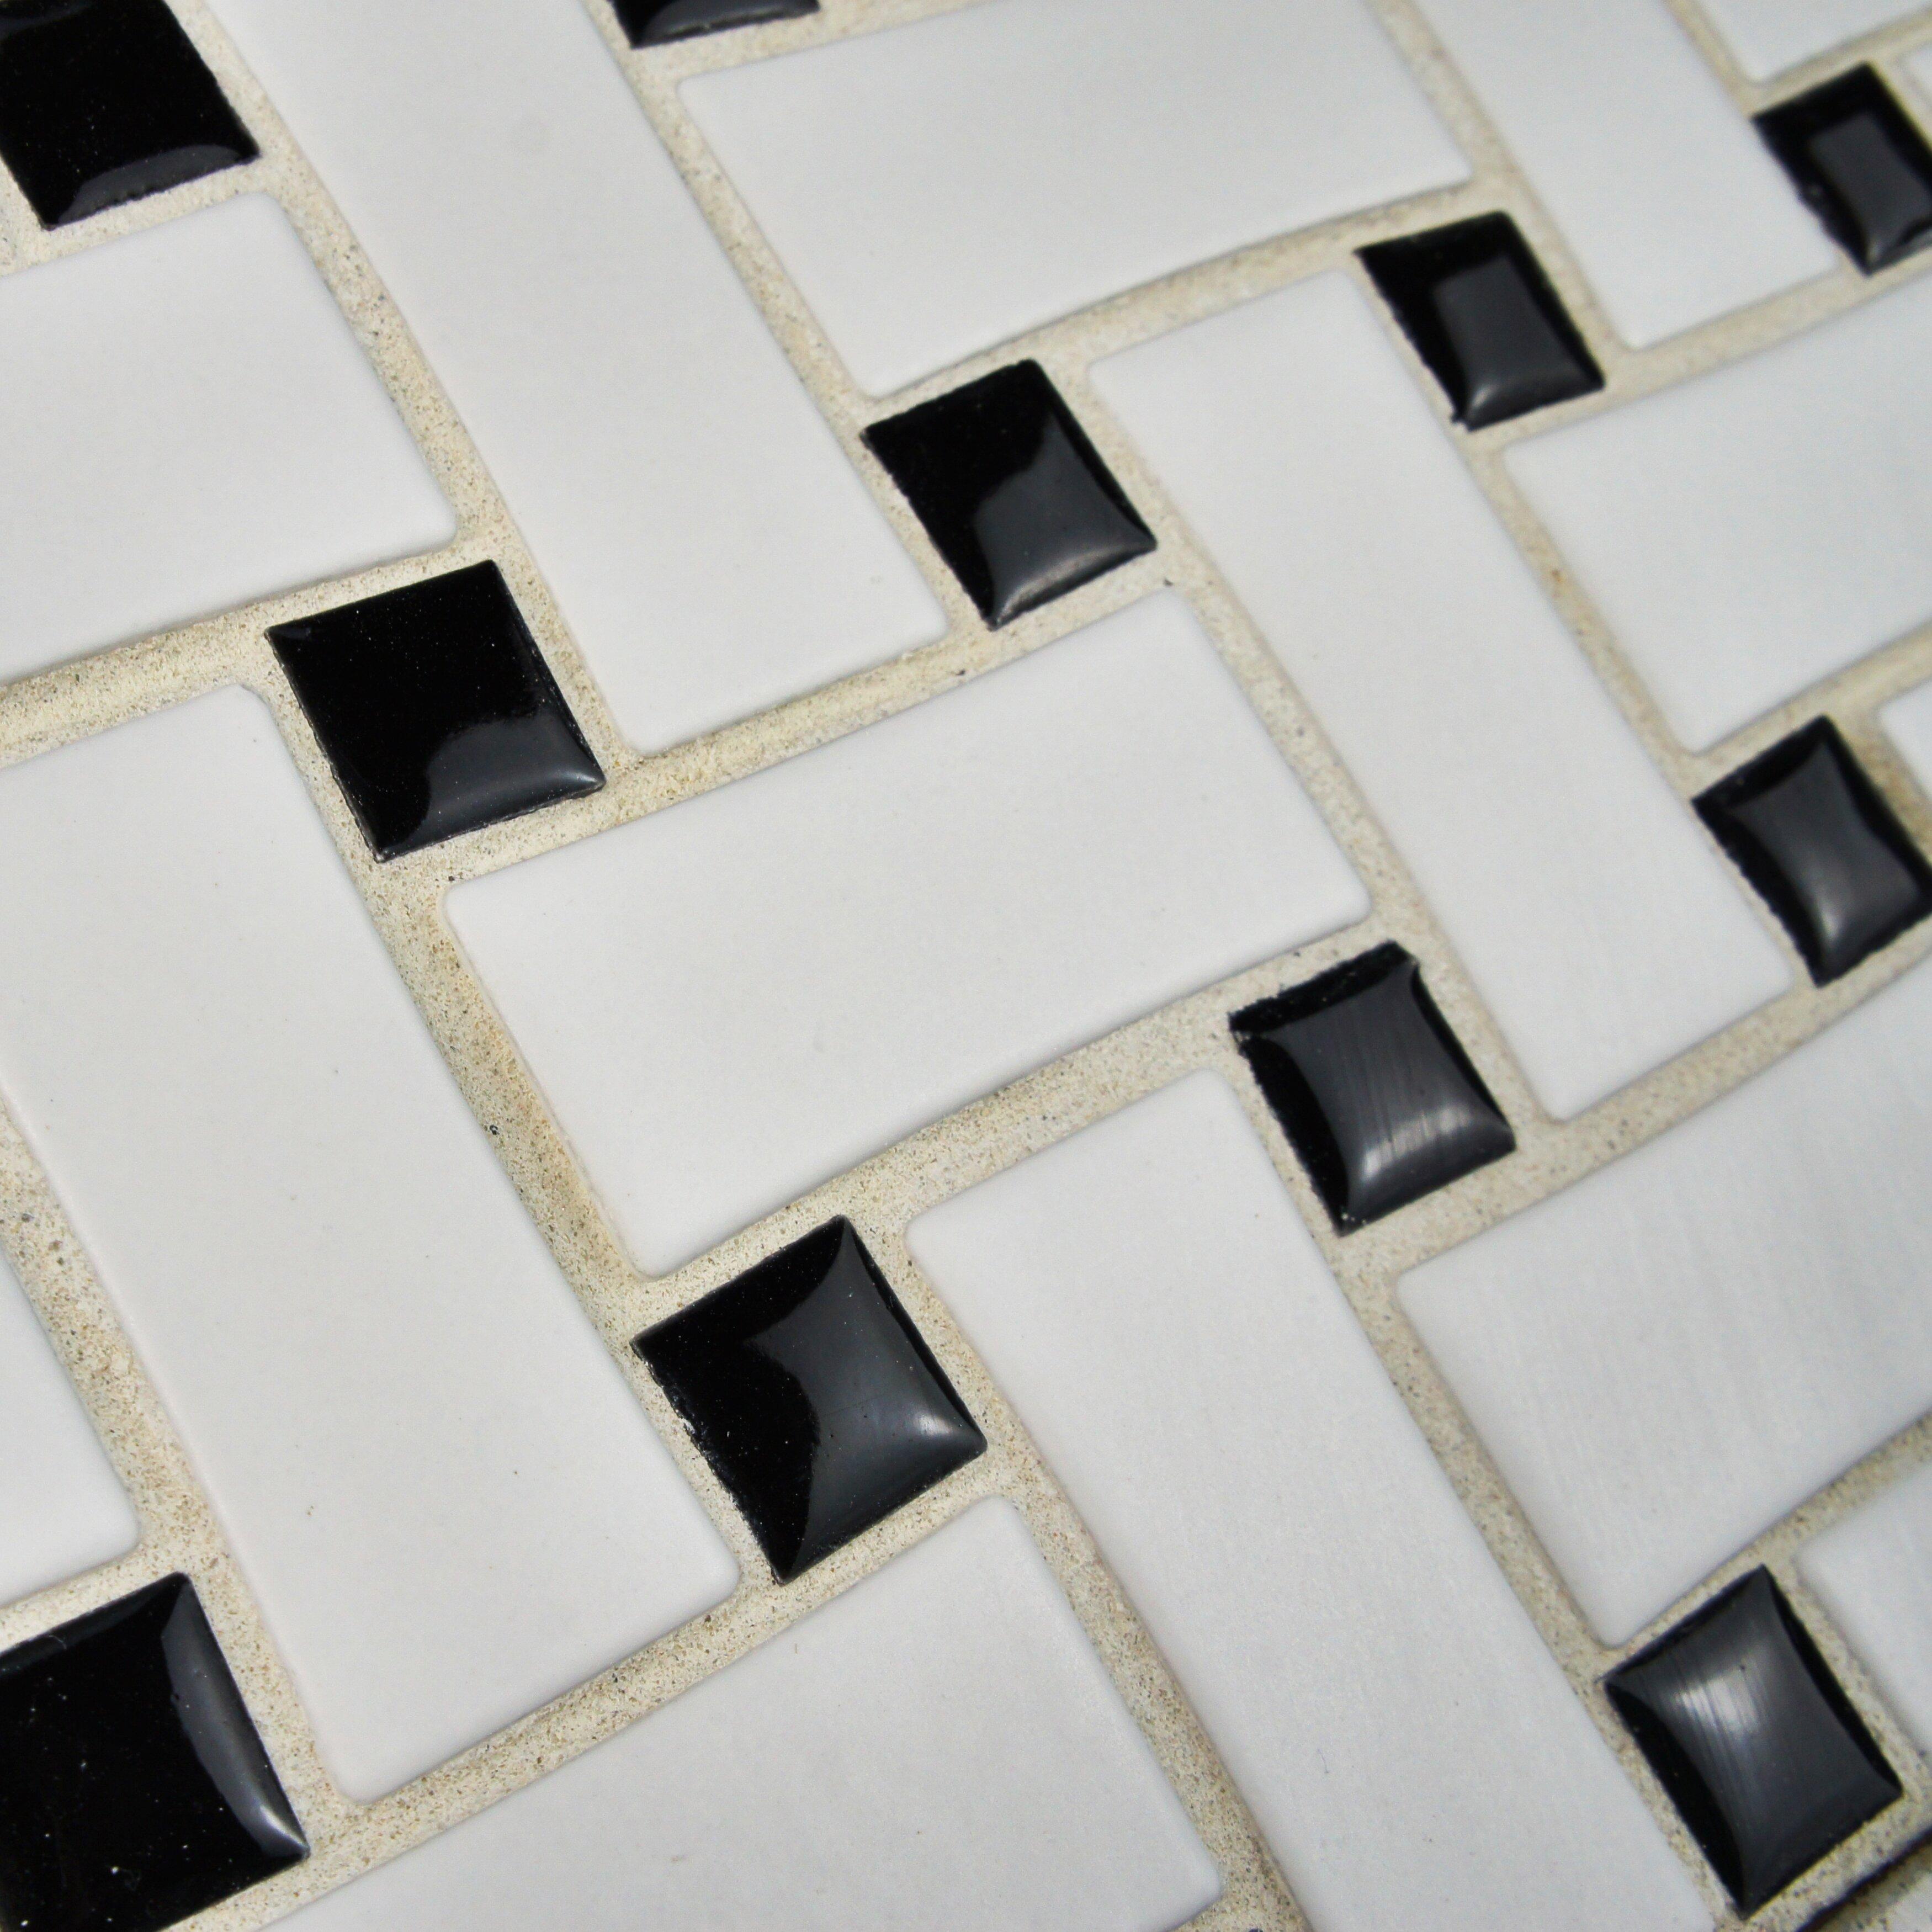 Elitetile retro basket weave 10 5 x 10 5 porcelain for 10 x 10 ceramic floor tile